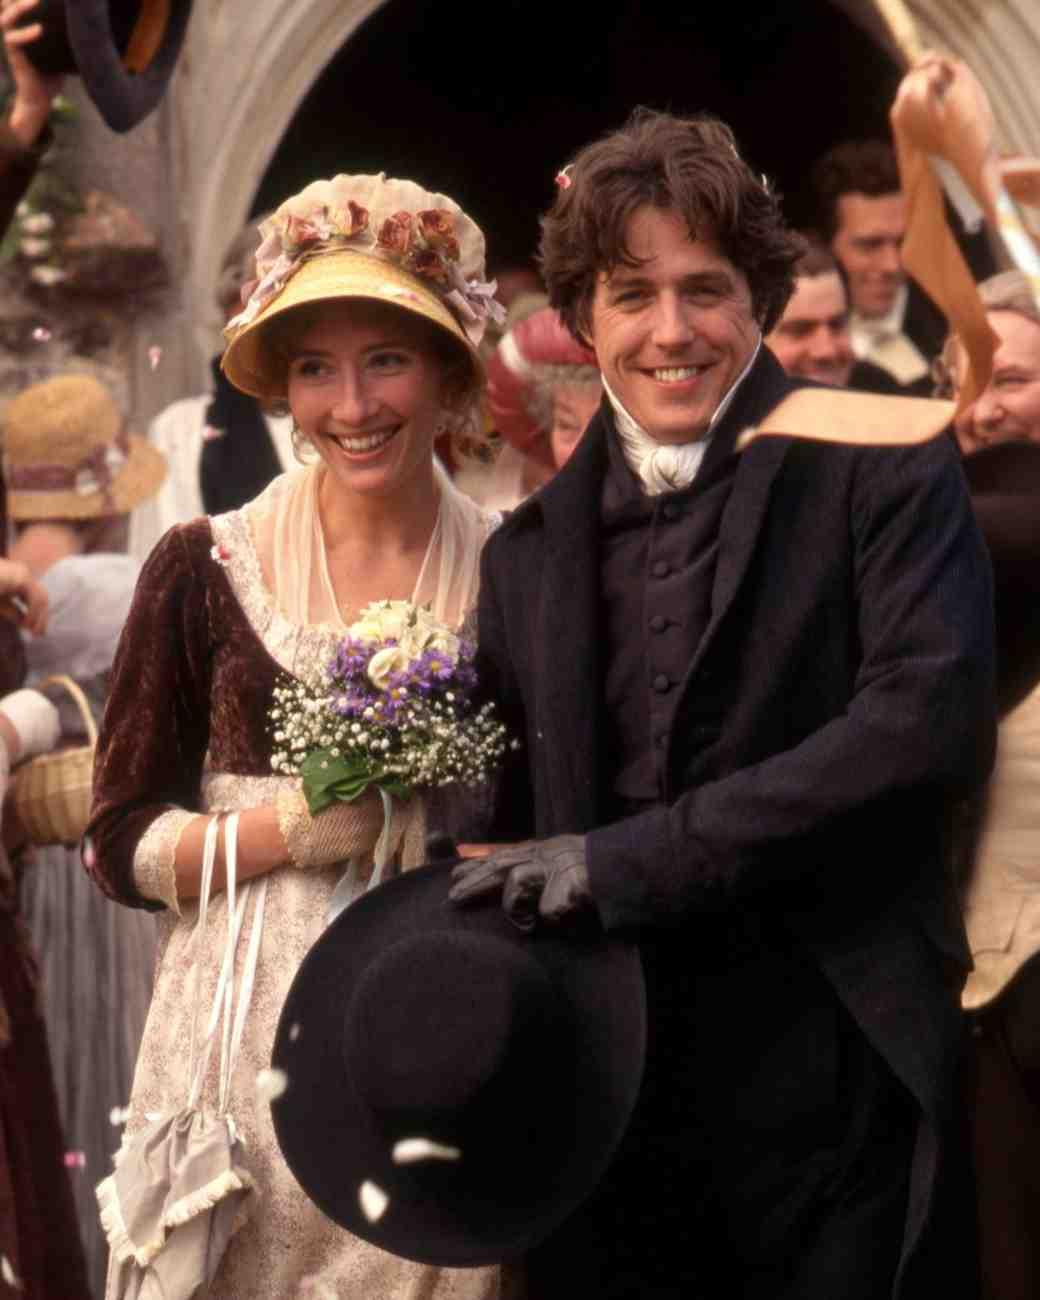 movie-wedding-dresses-sense-sensibility-hugh-grant-emma-thompson-0216.jpg